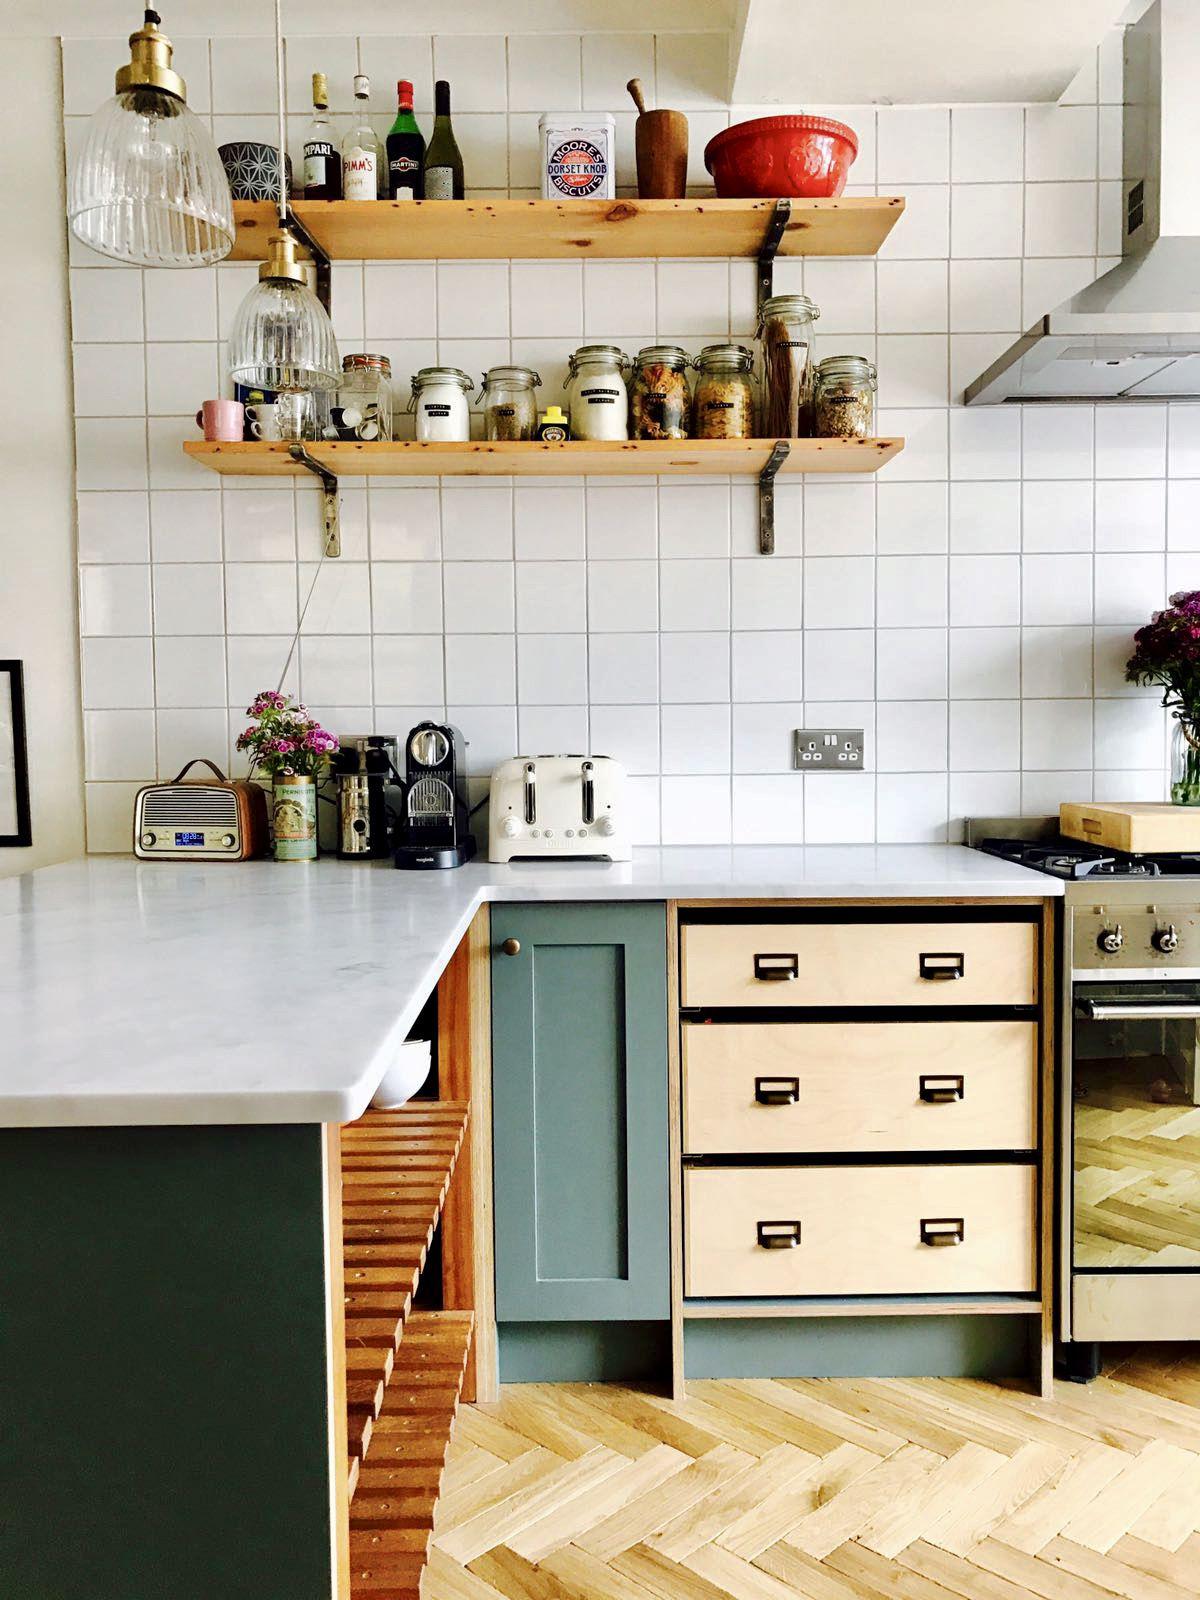 Bespoke Kitchens Kitchen Bespoke Kitchens Kitchen Cabinets